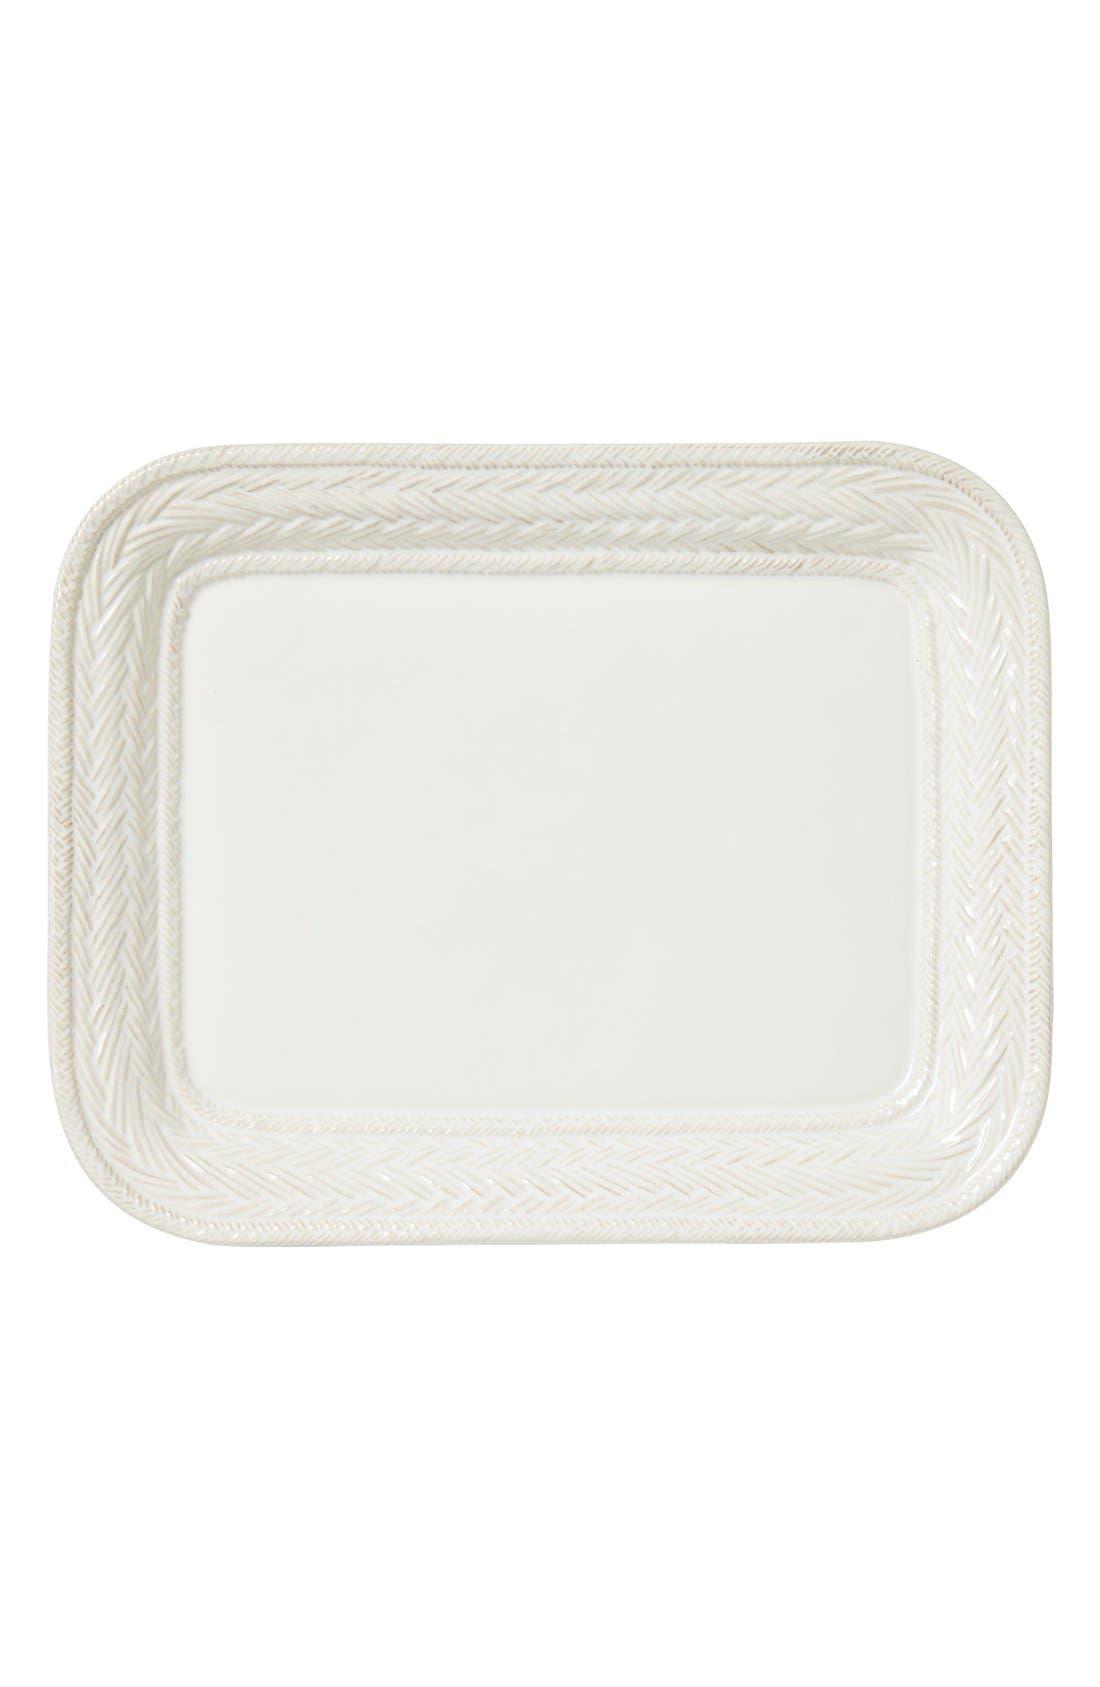 Le Panier Large Ceramic Platter,                             Main thumbnail 1, color,                             White